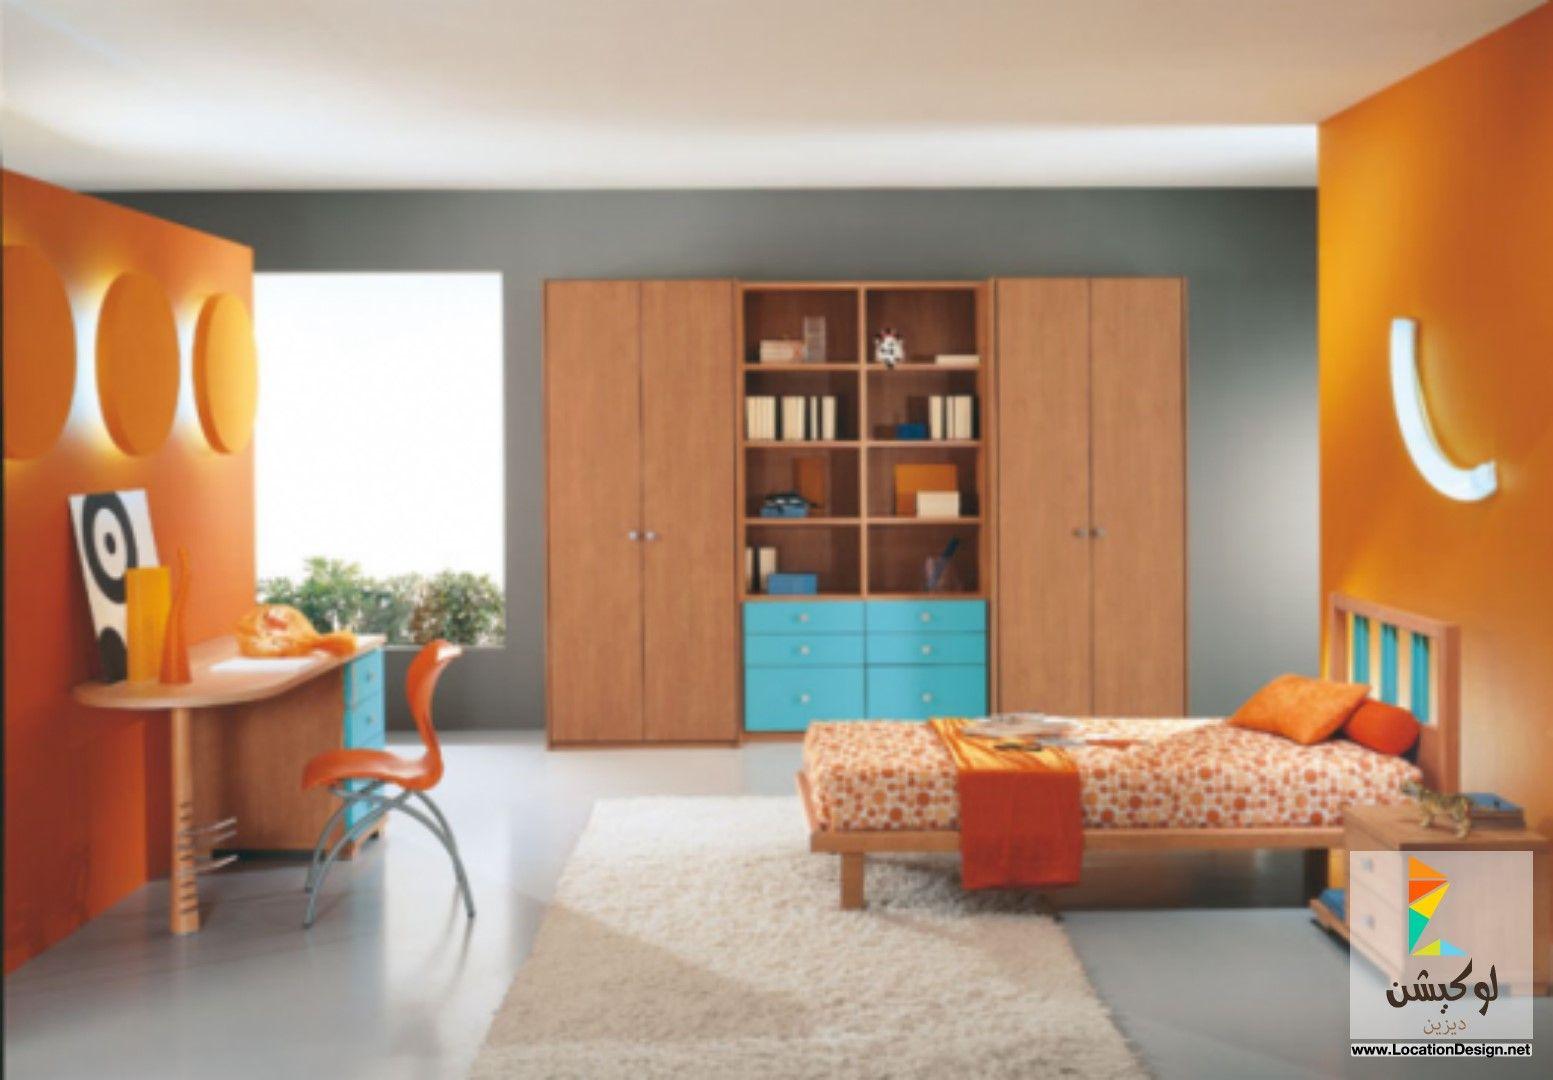 احدث 10 تصميمات غرف نوم اطفال ايكيا 2015 لوكشين ديزين نت Fall Interior Decor Luxury House Designs Modern Interior Design